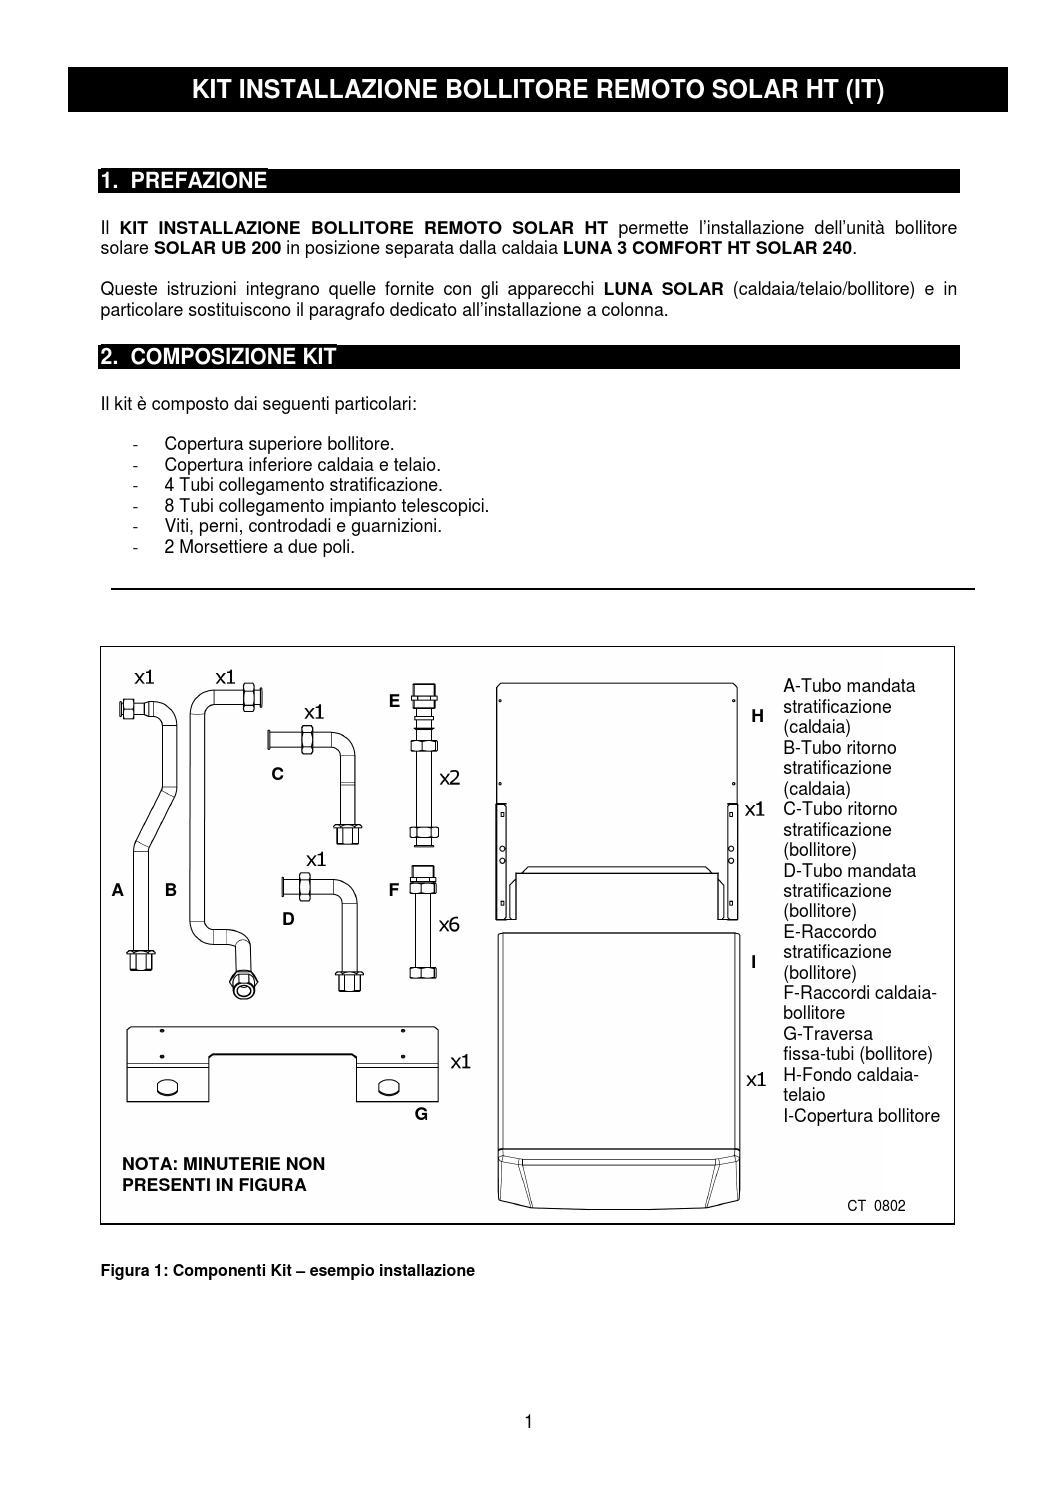 Manuale kit bollitore solare remoto baxi by baxi spa issuu for Istruzioni caldaia baxi